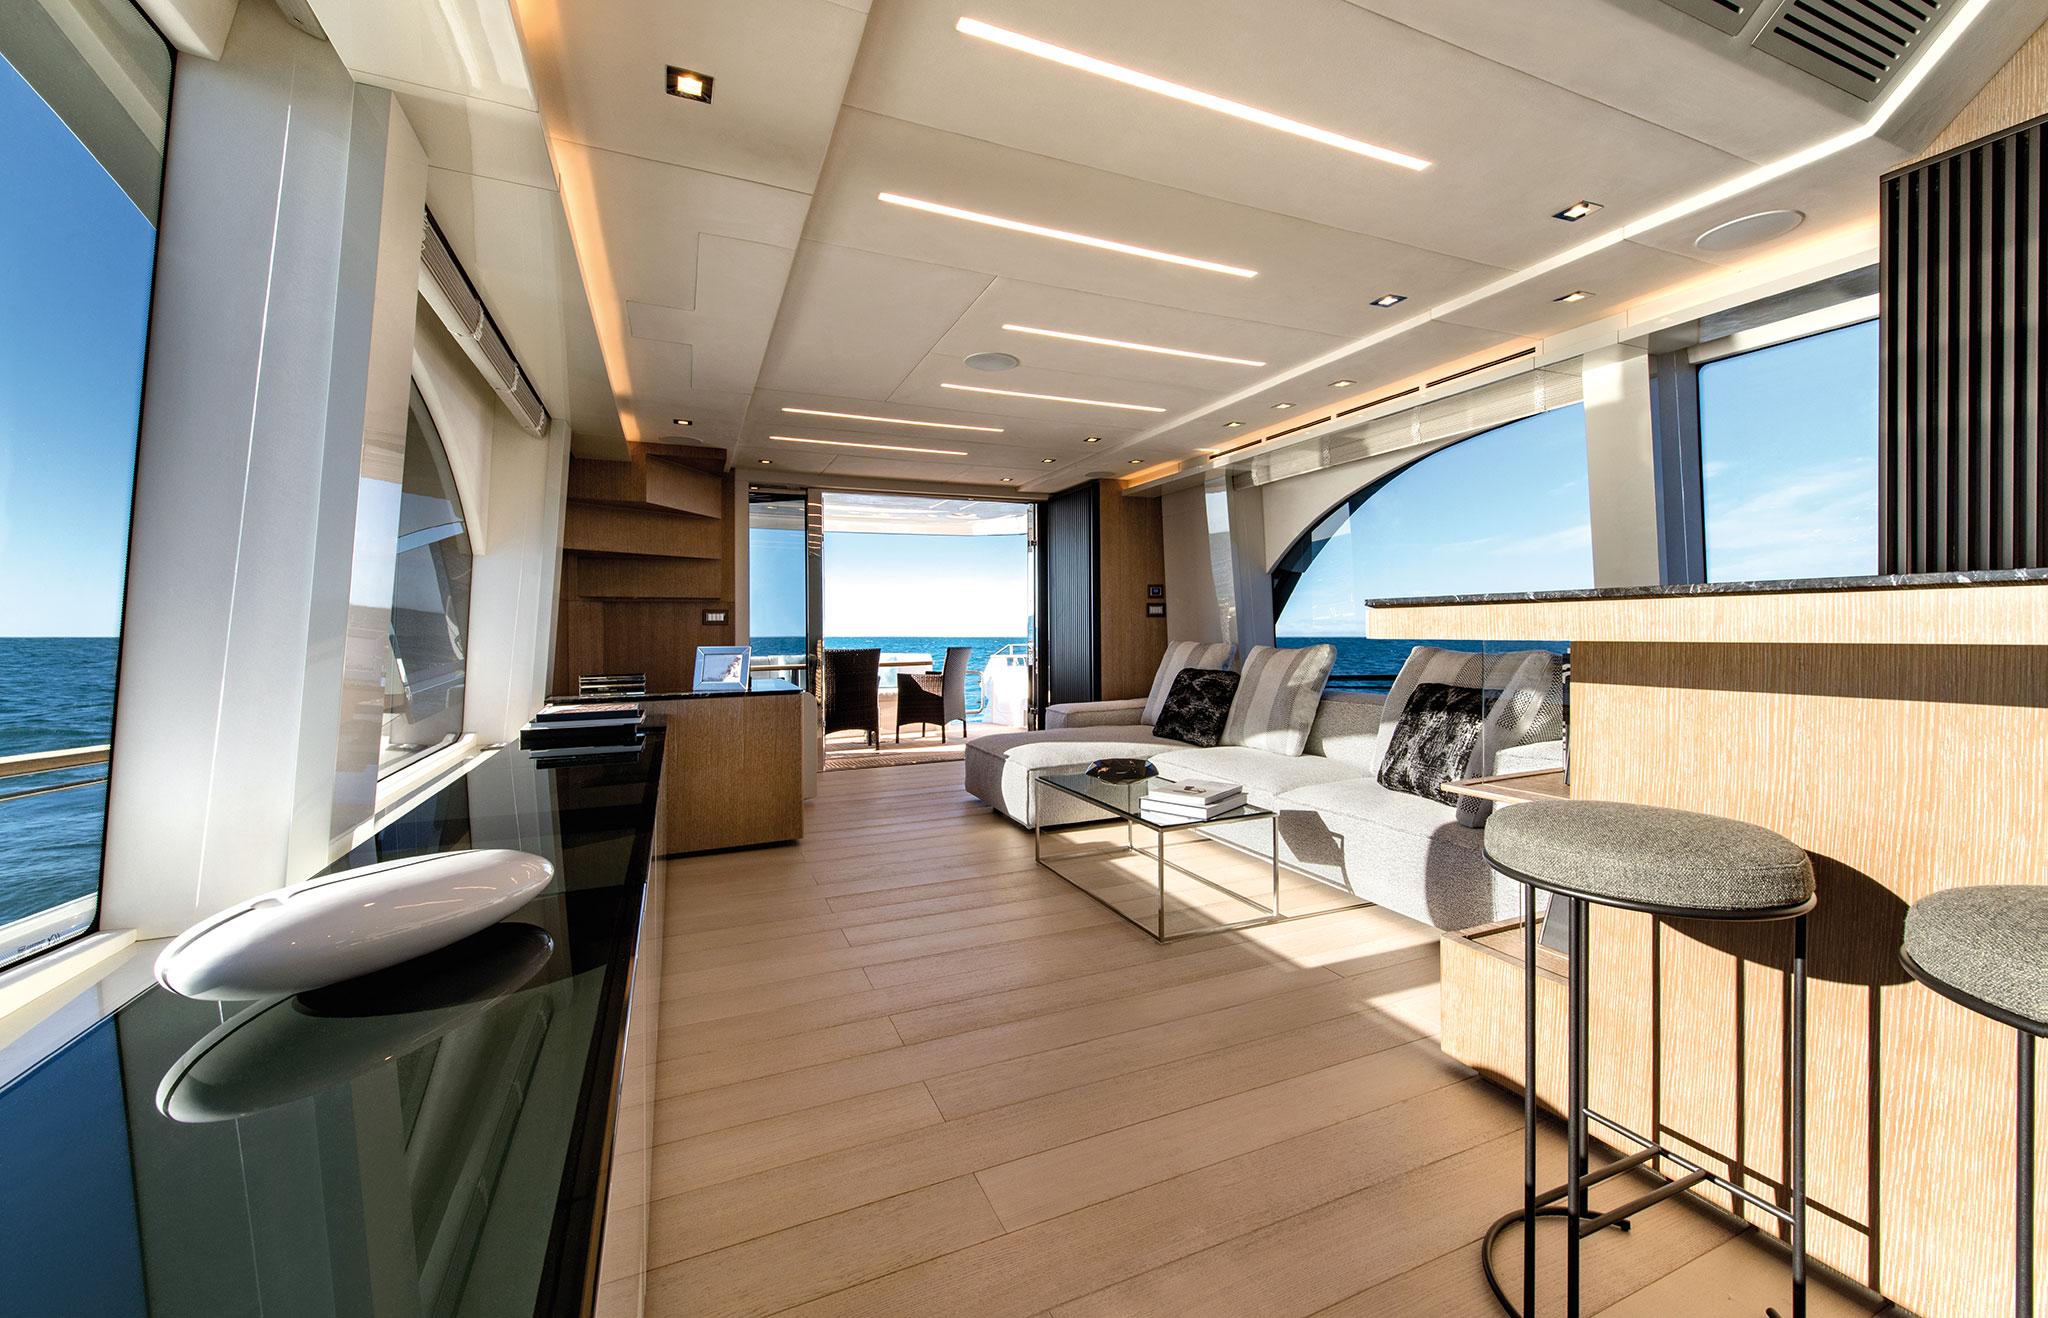 monte-carlo-yachts-70-Salon_03-yachts-france-172